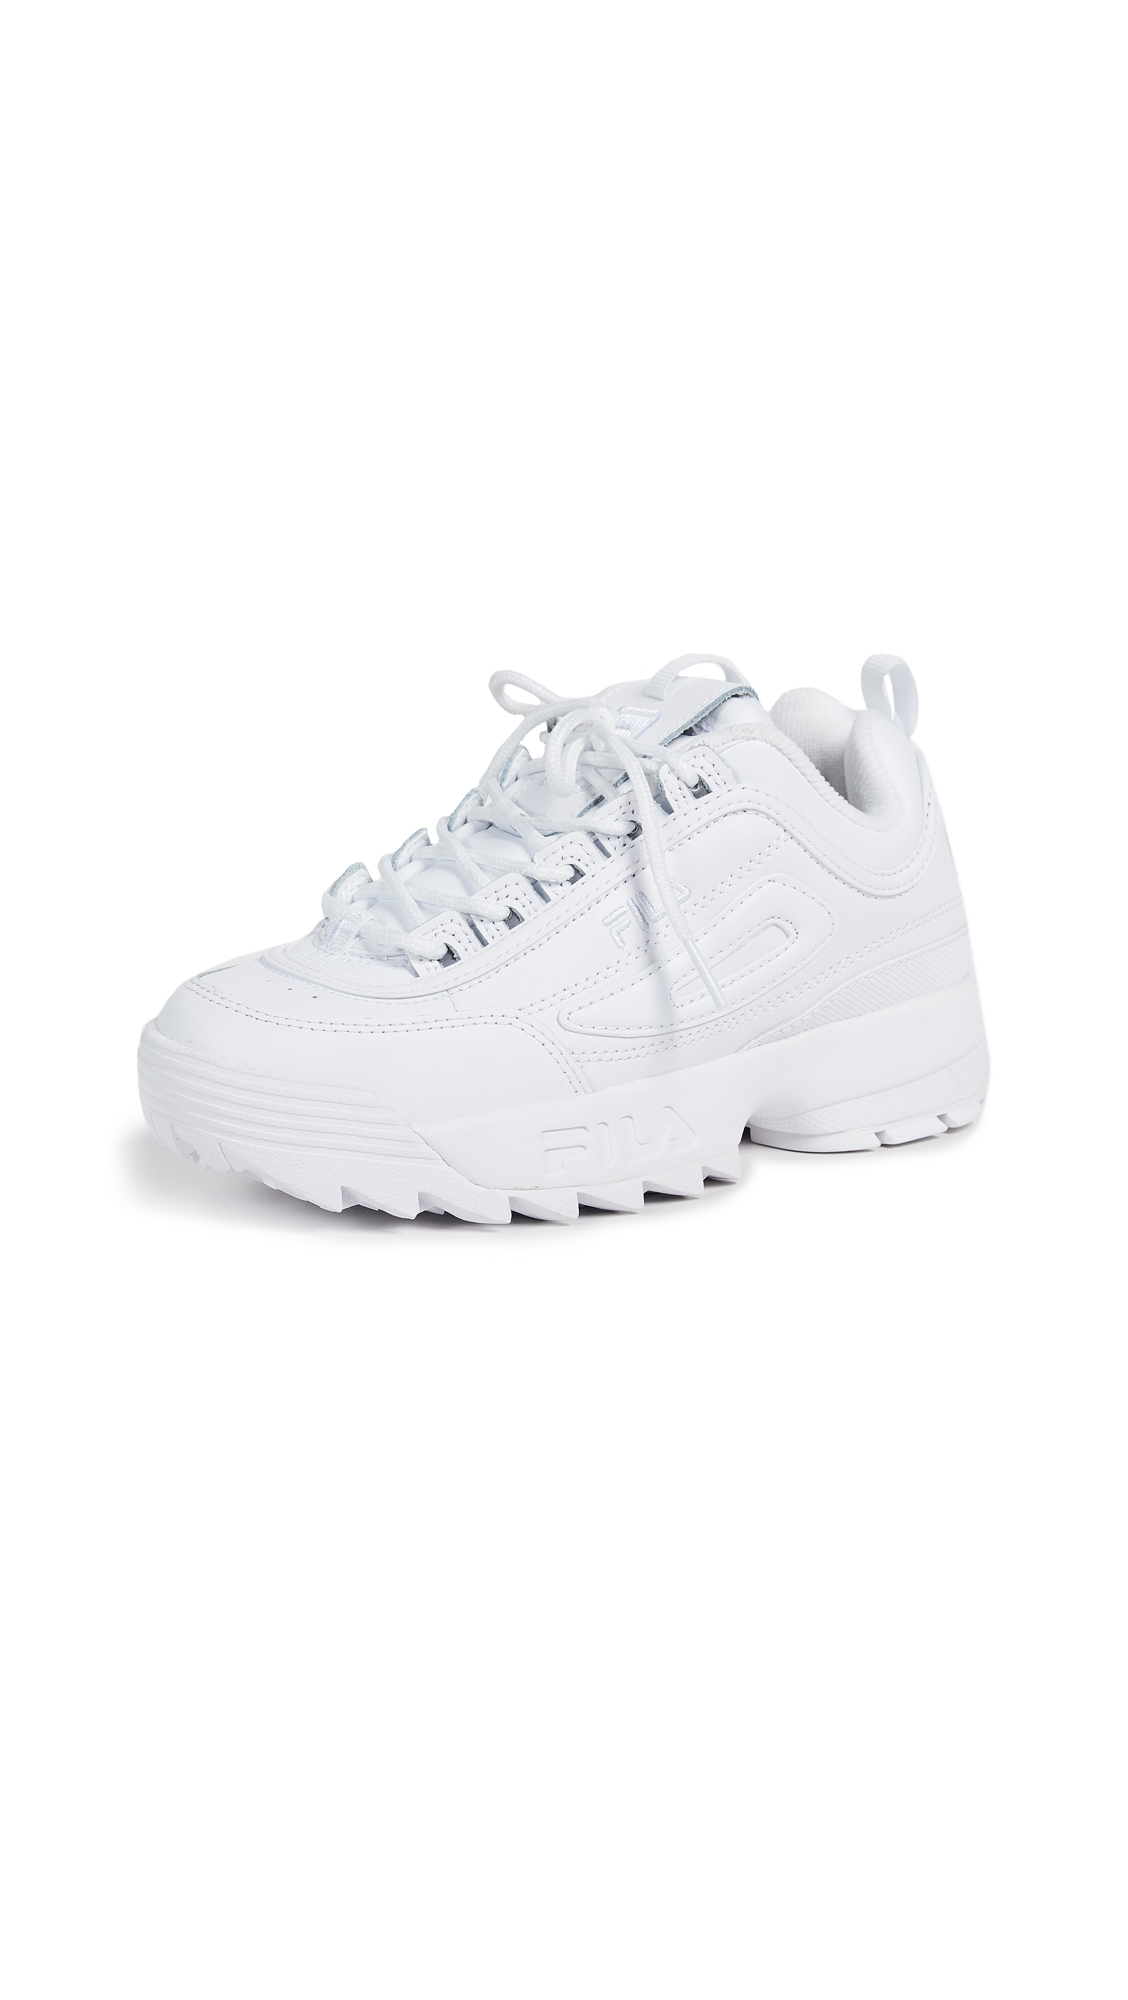 Fila Disruptor II Premium Sneakers - White/White/White